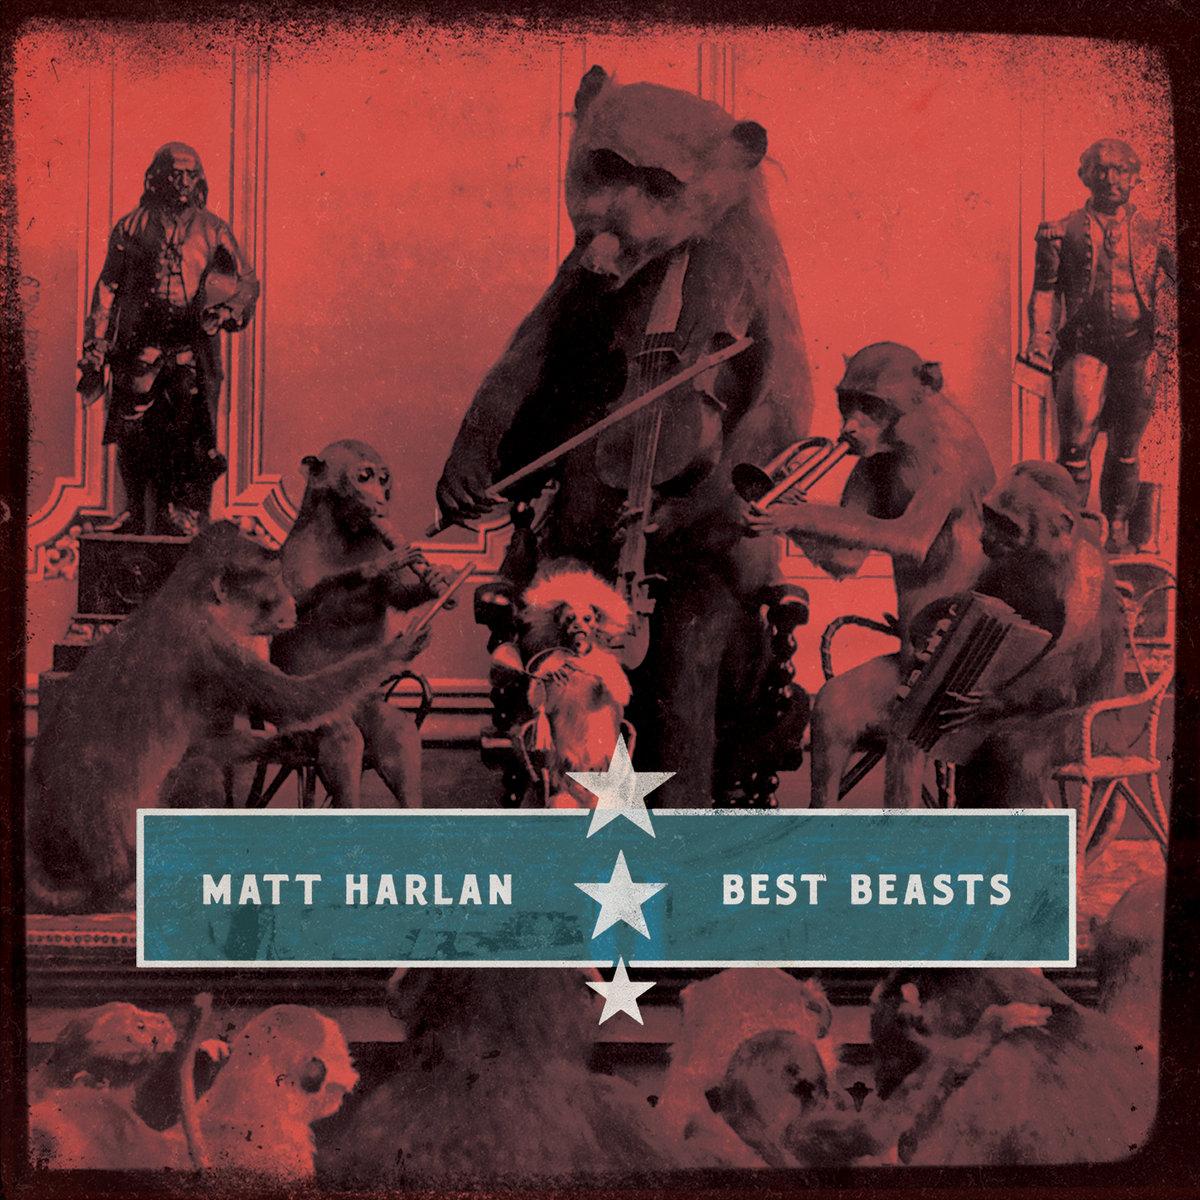 Best Beasts | Matt Harlan